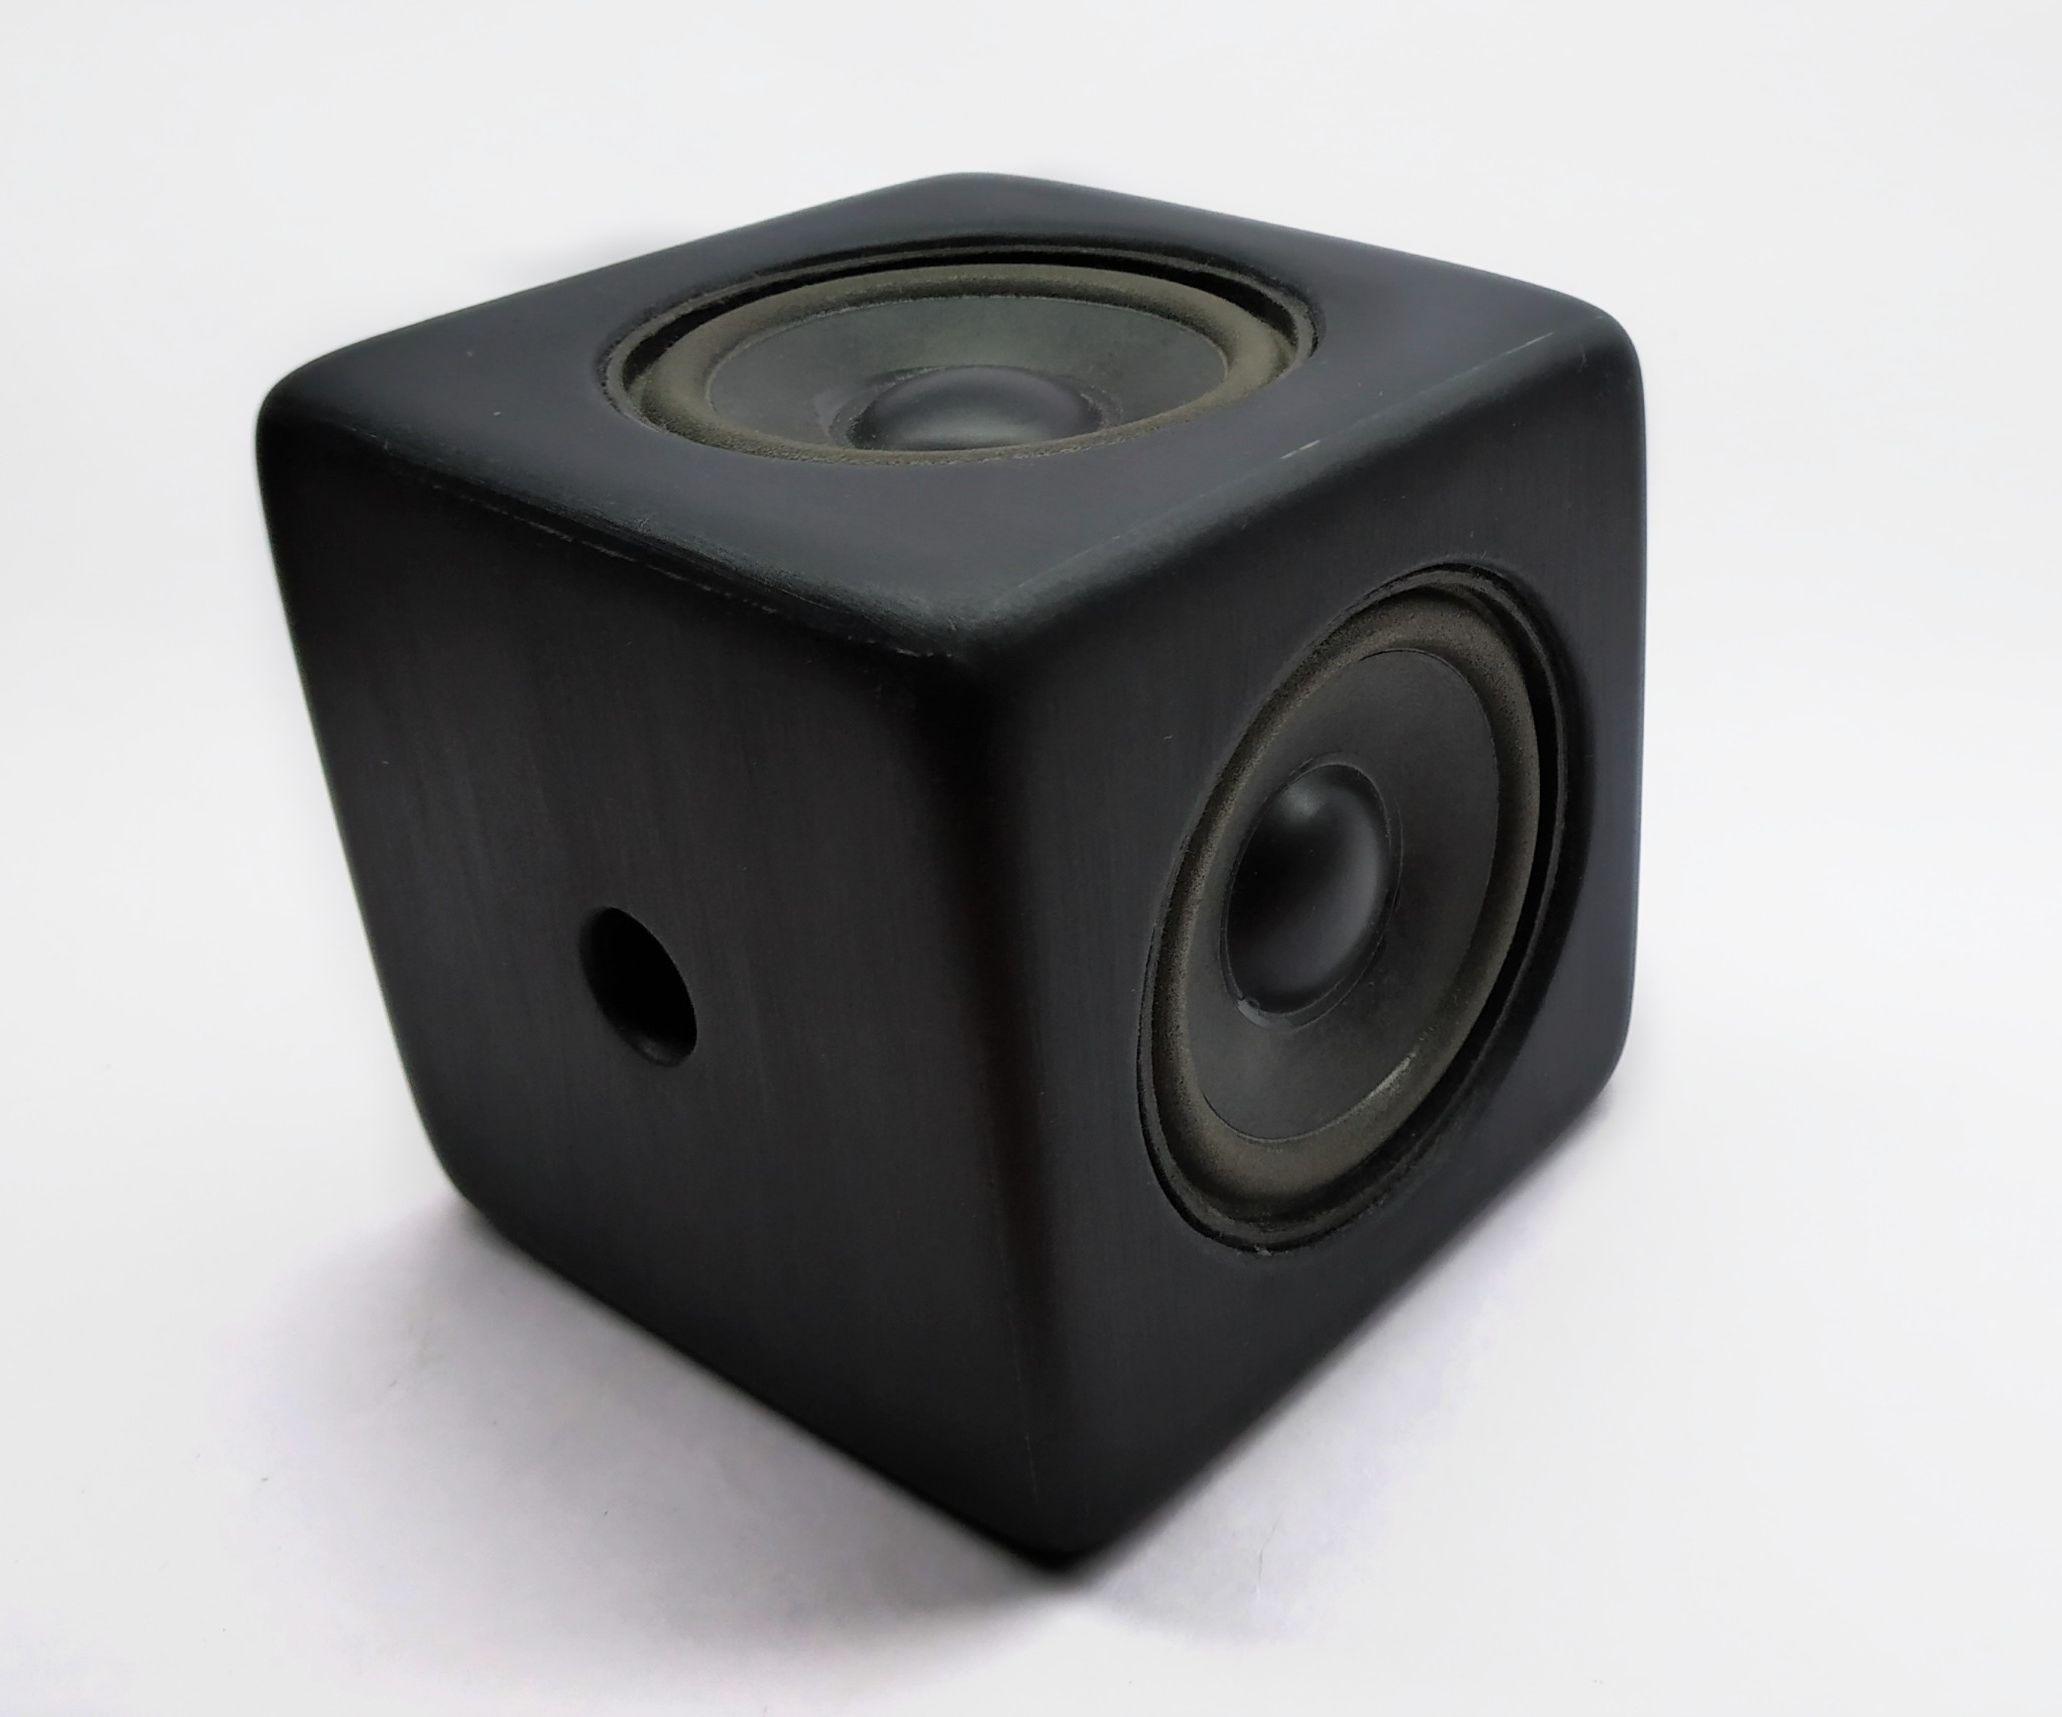 DIY Bluetooth Speaker (CubeBOX)